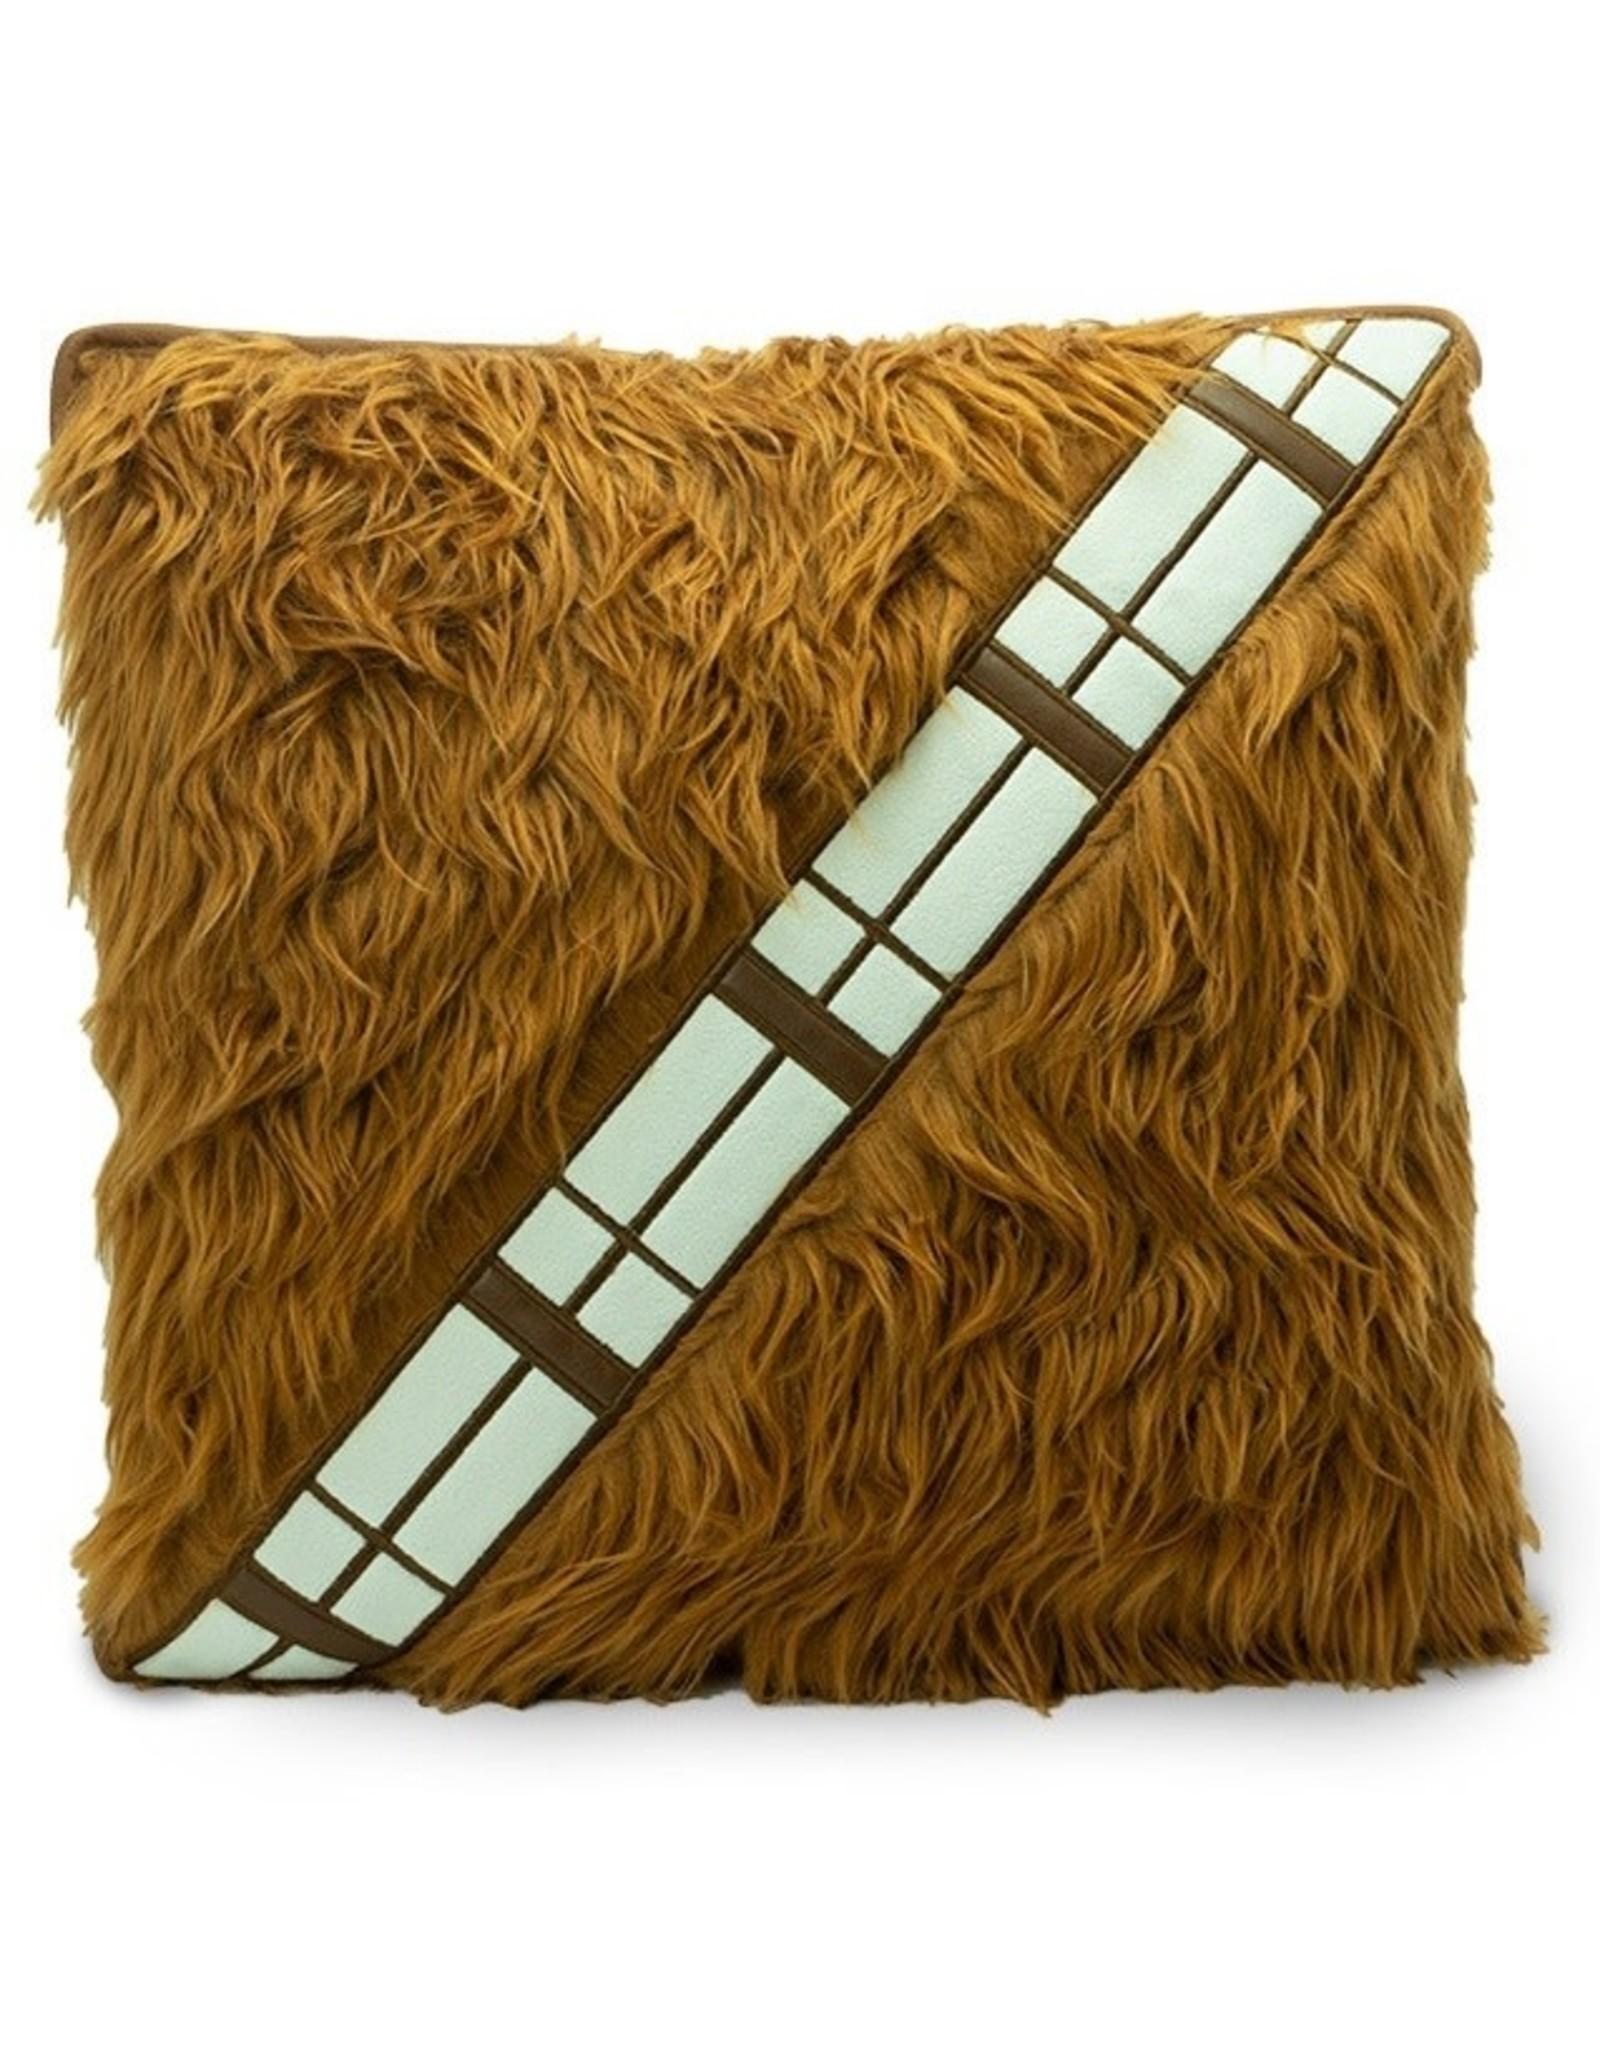 STAR WARS Chewbacca cushion